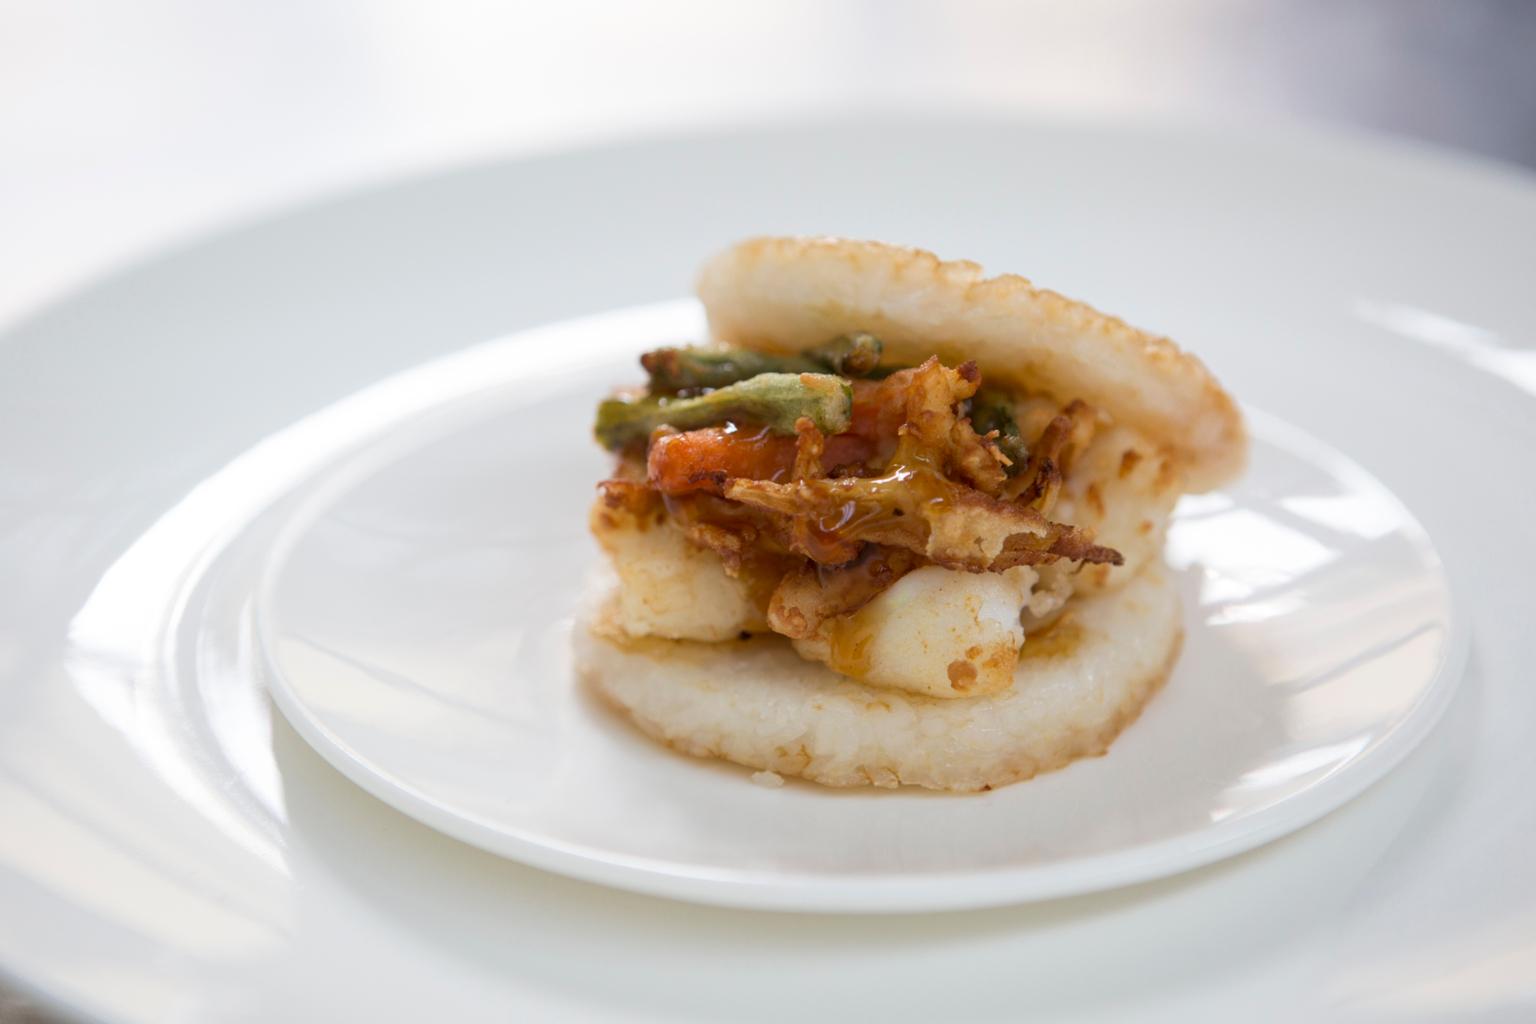 Rice Burger - Ristorante Mos